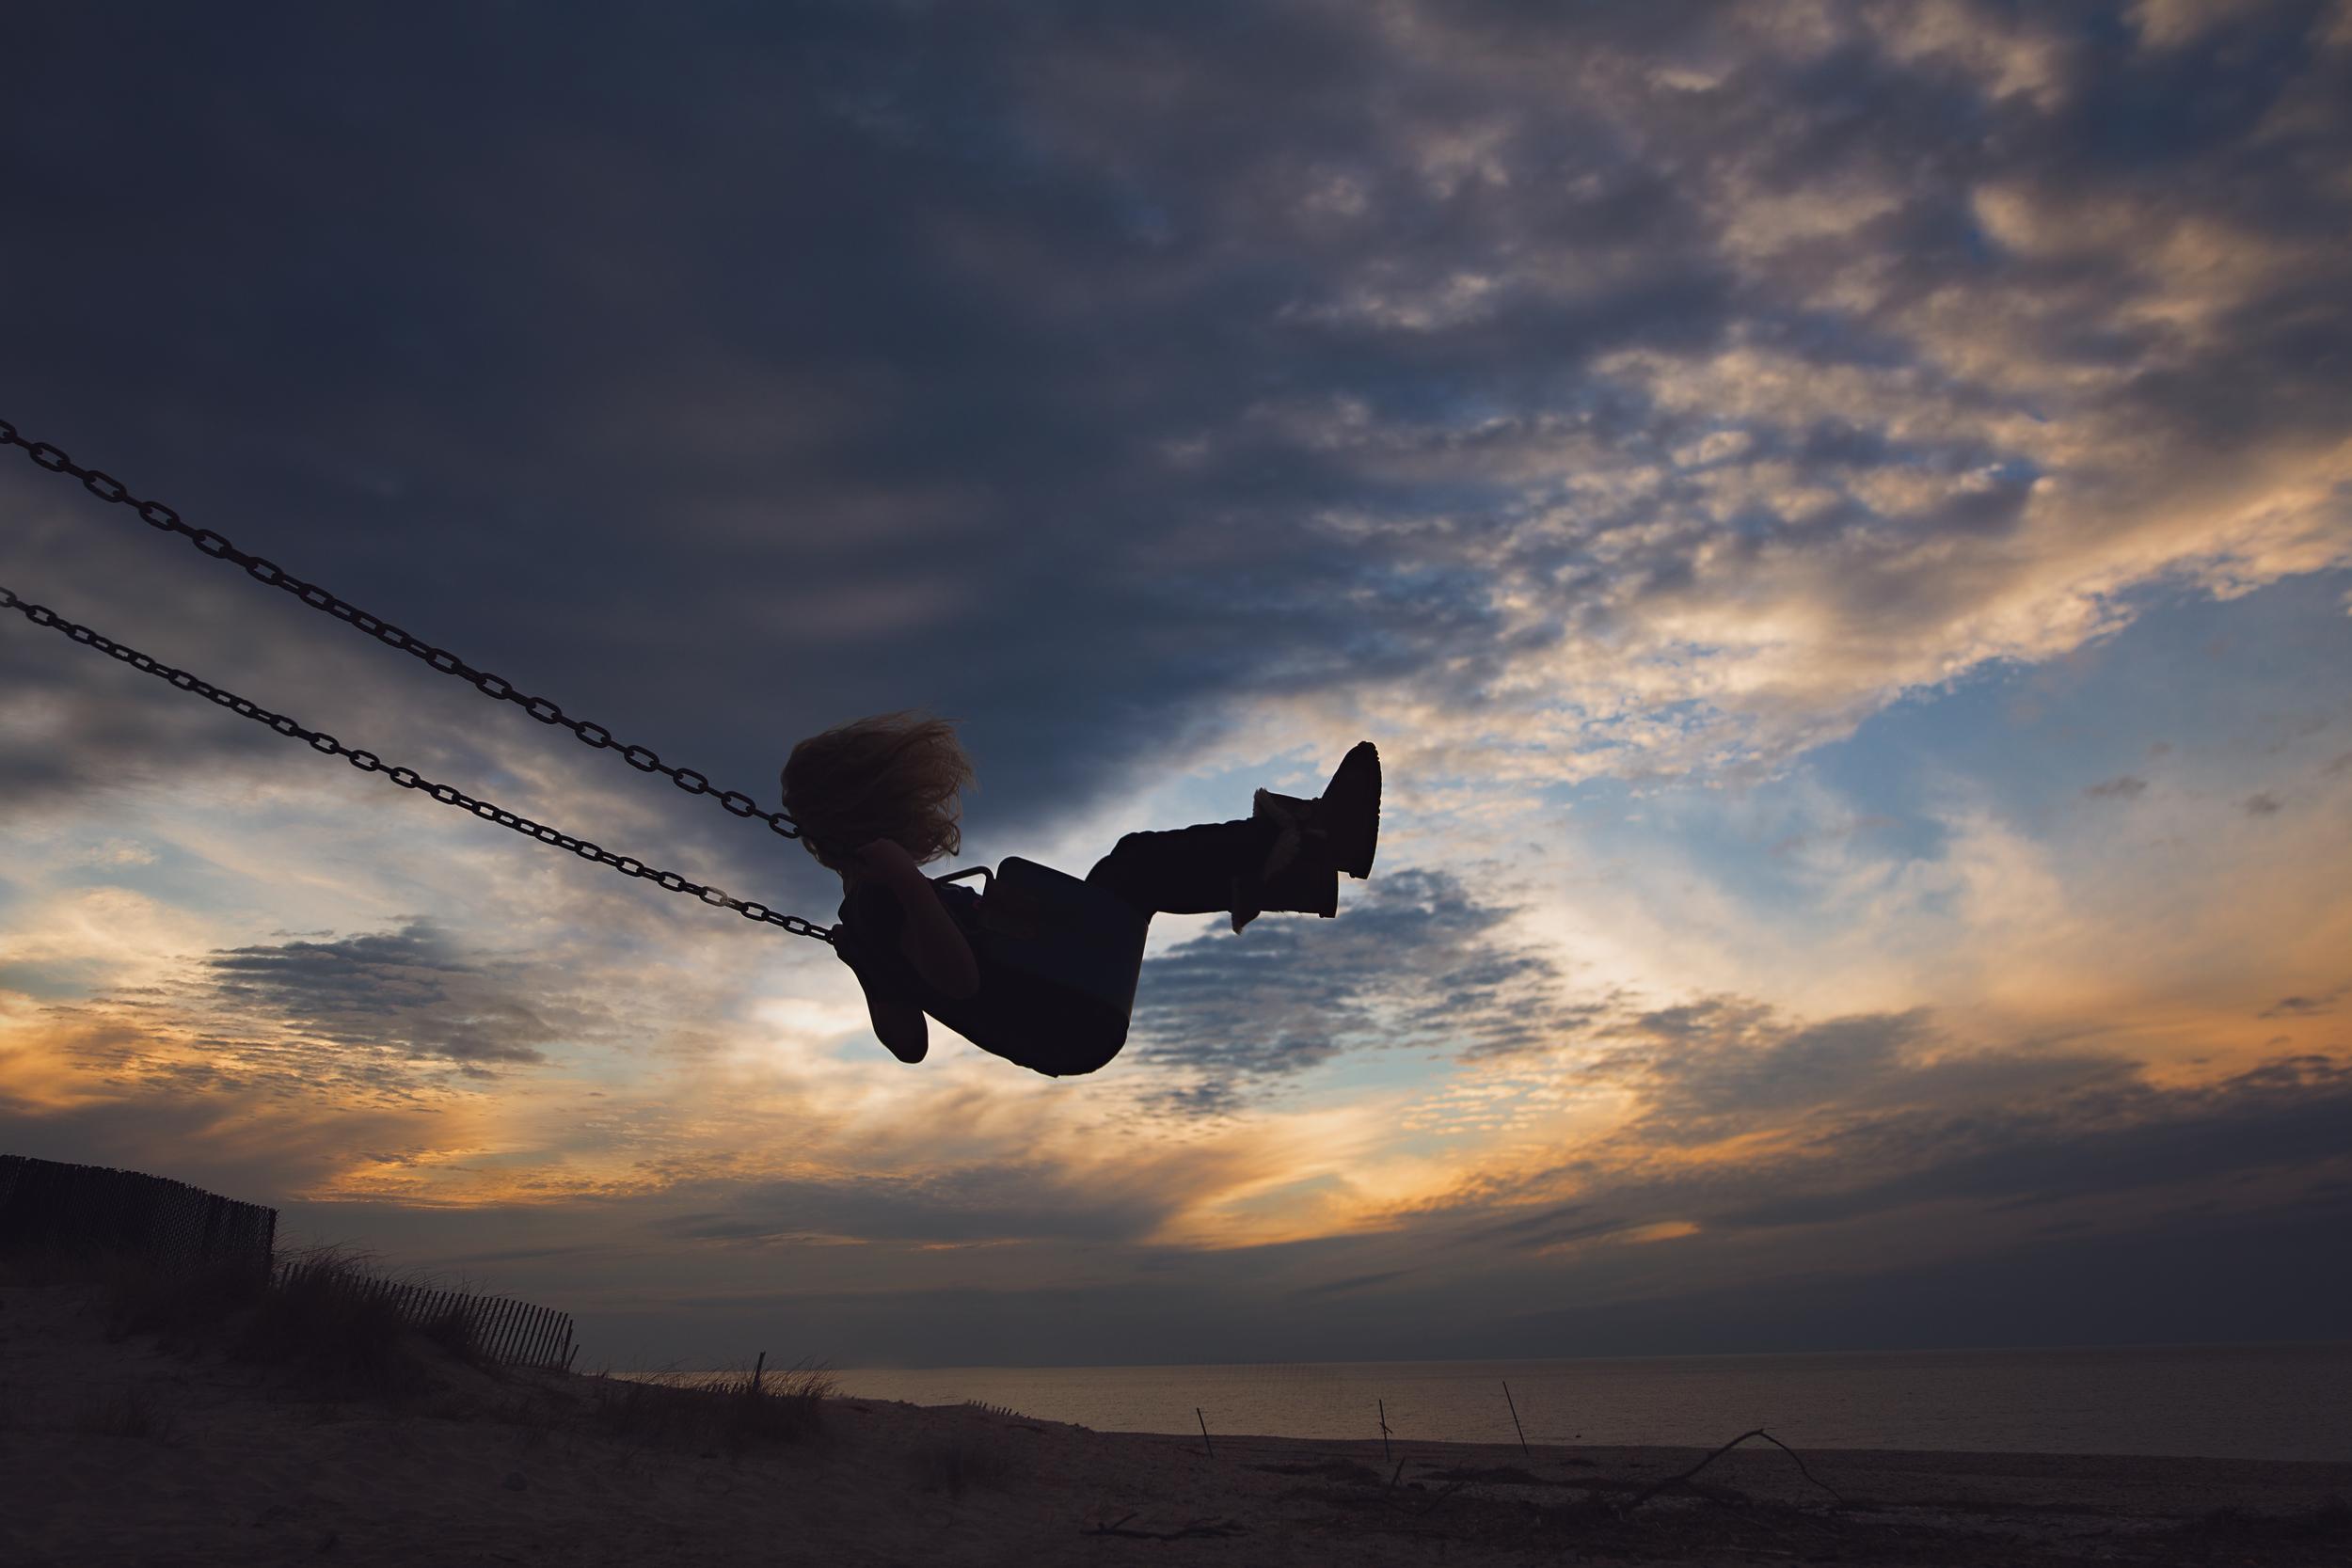 Long-Island-family-photographer-hello-olivia-photography-silhouette-sunset.jpg